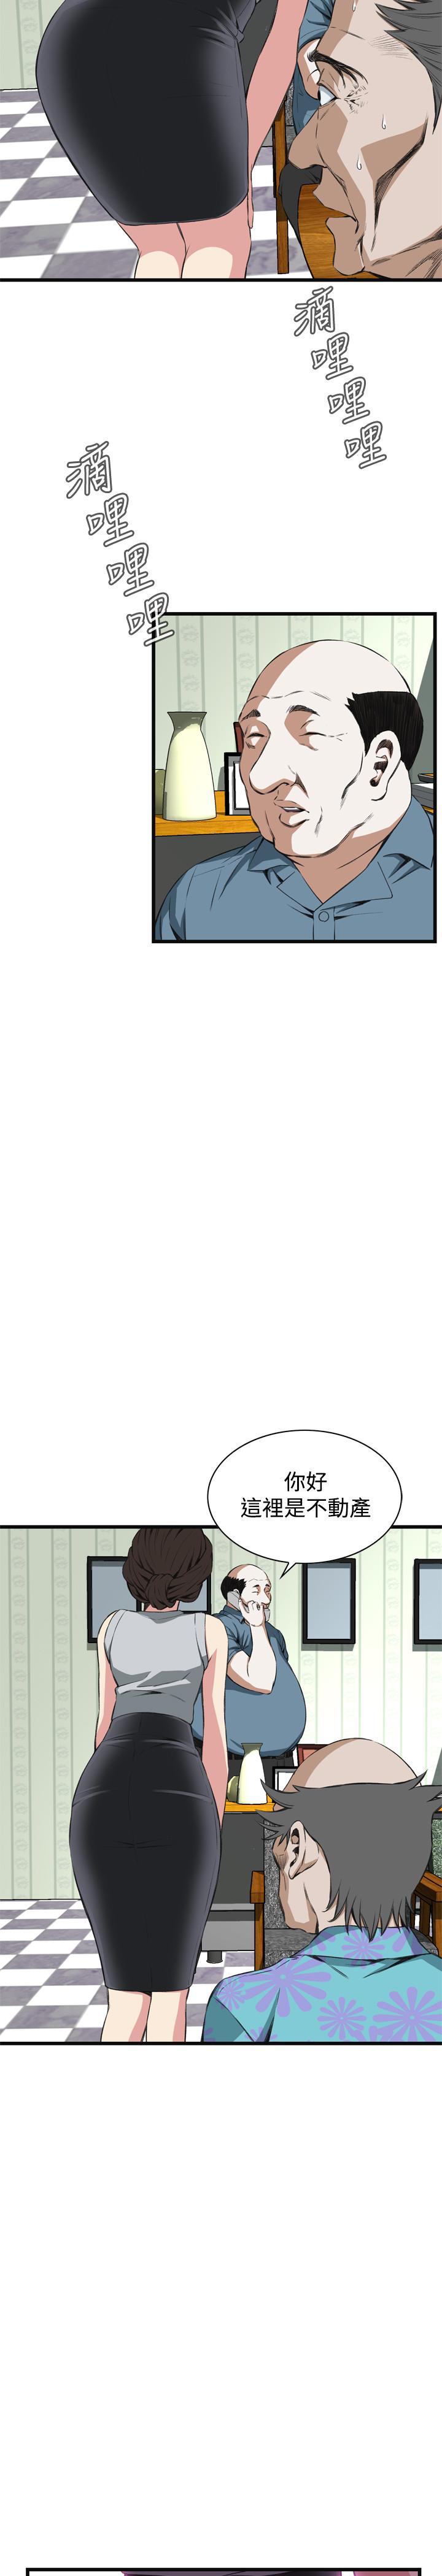 Take a Peek 偷窥 Ch.39~60 [Chinese]中文 625